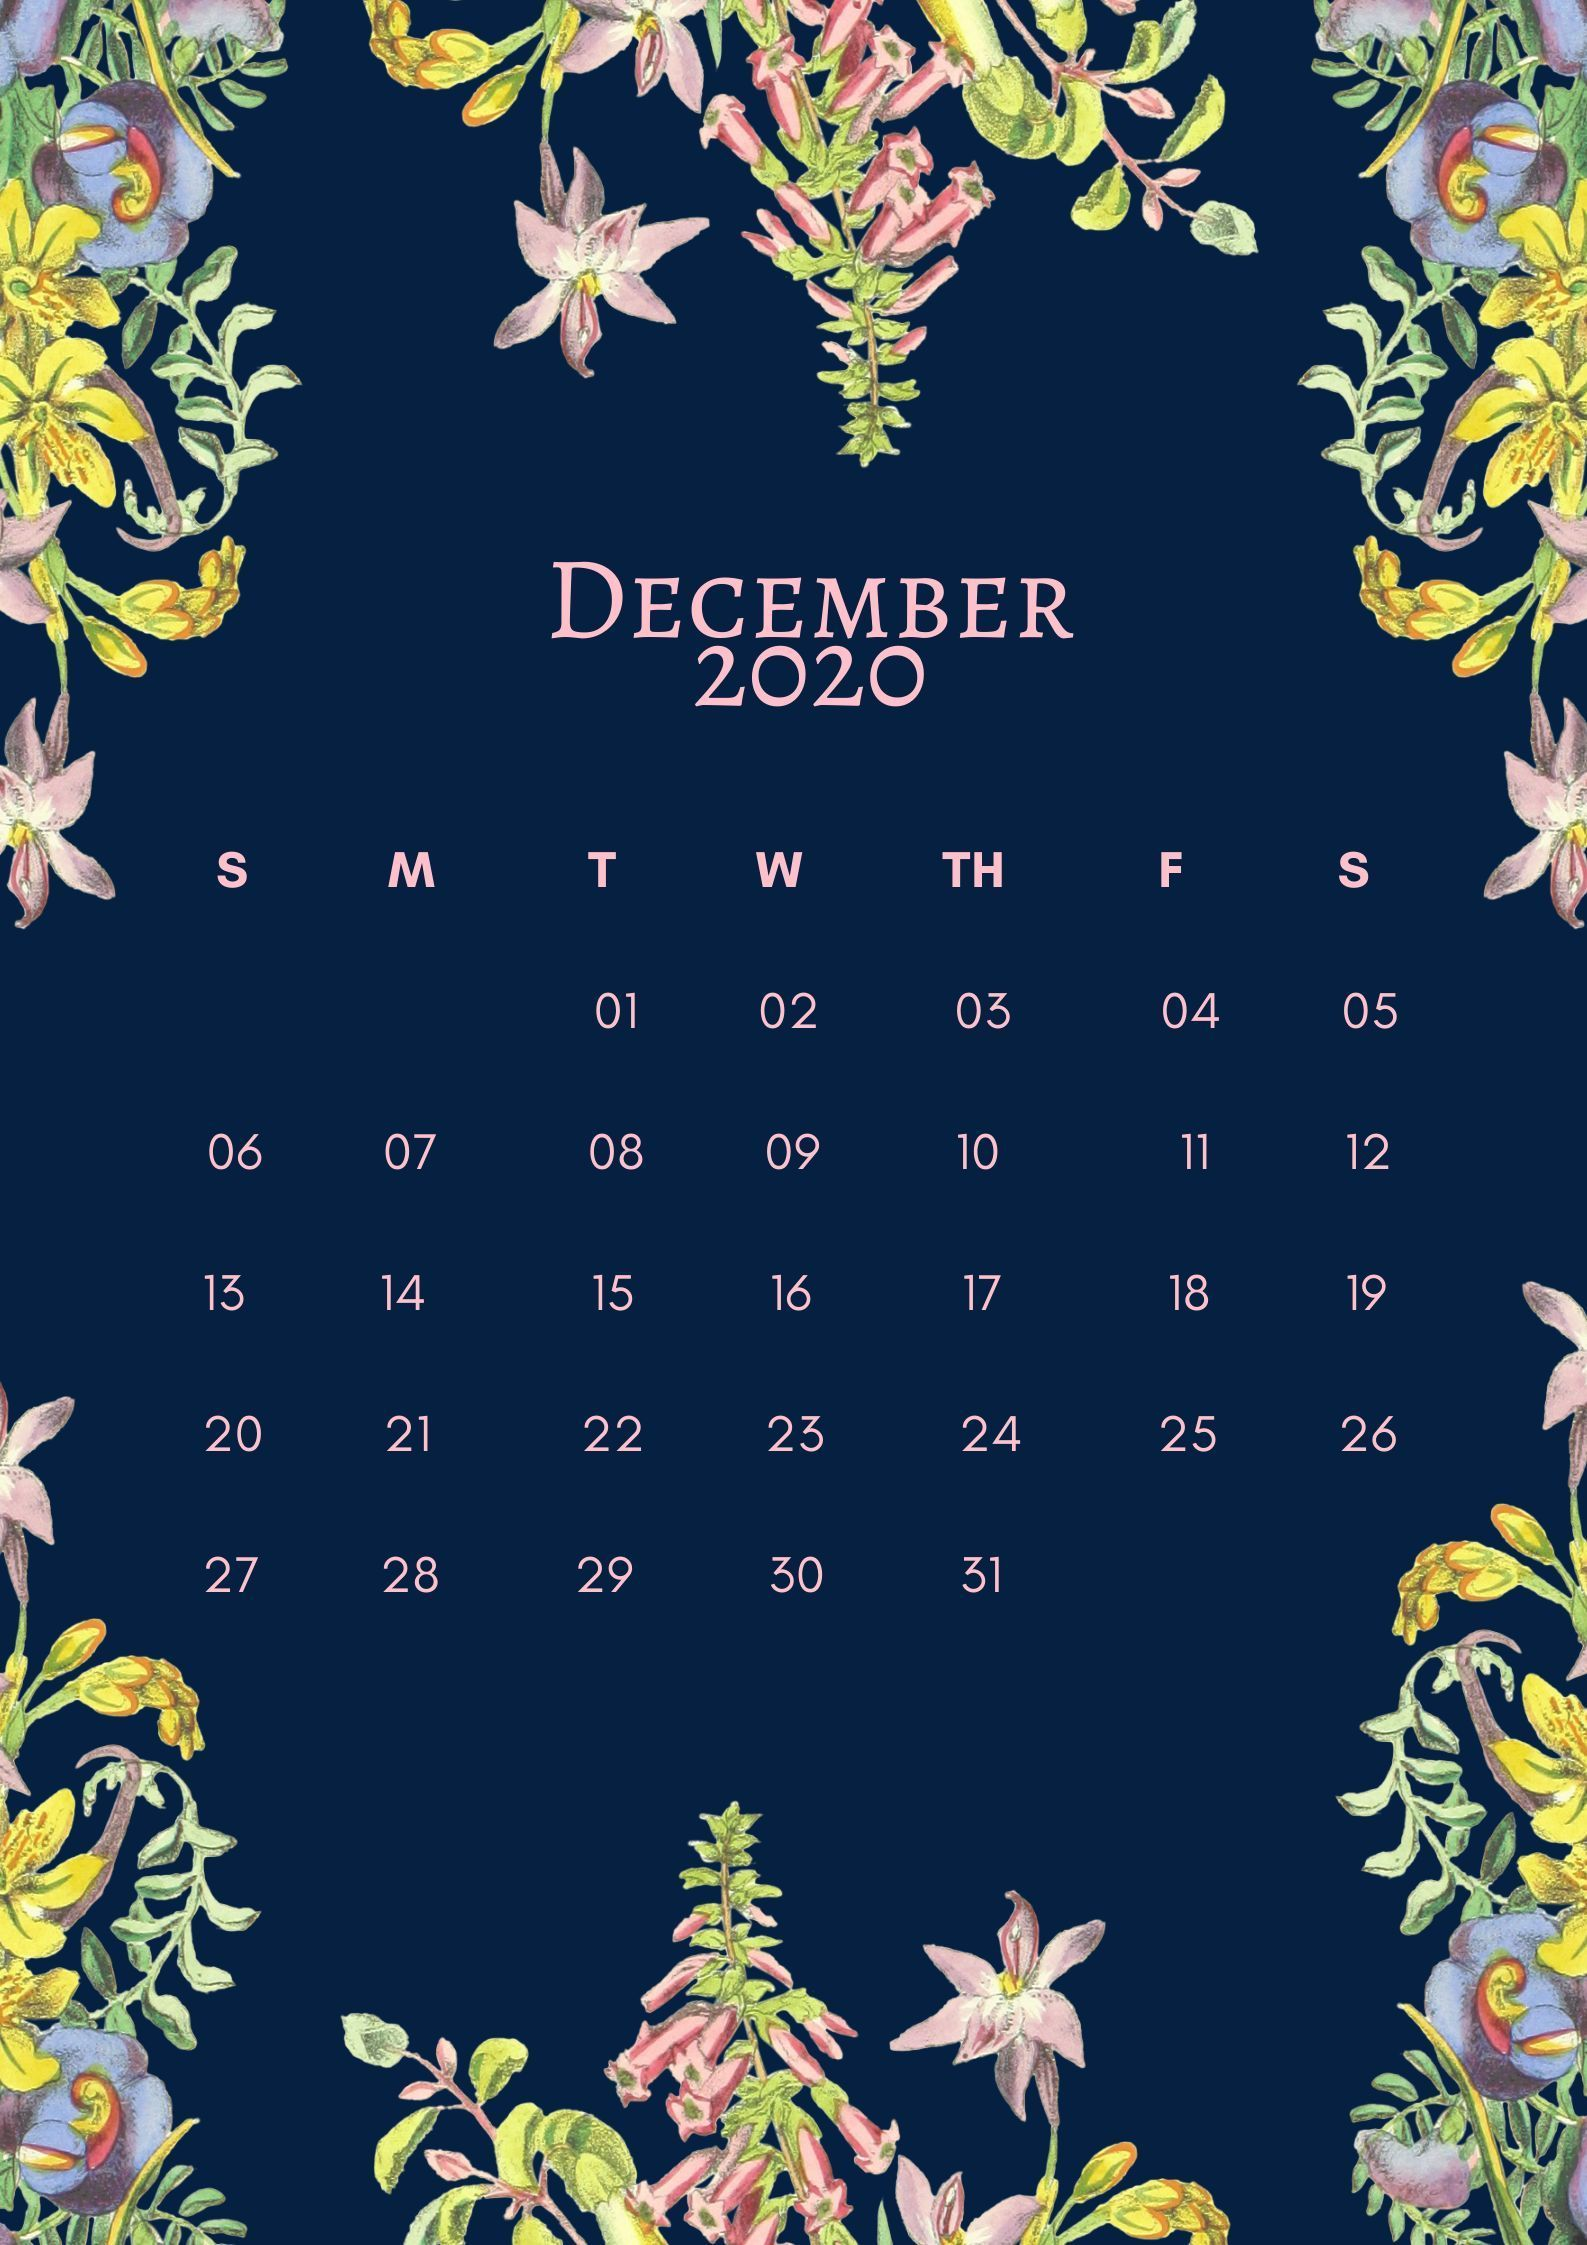 Pin By Kasia Sontag On Calendar Printables Floral Printables Monthly Calendar Printable Calendar Printables